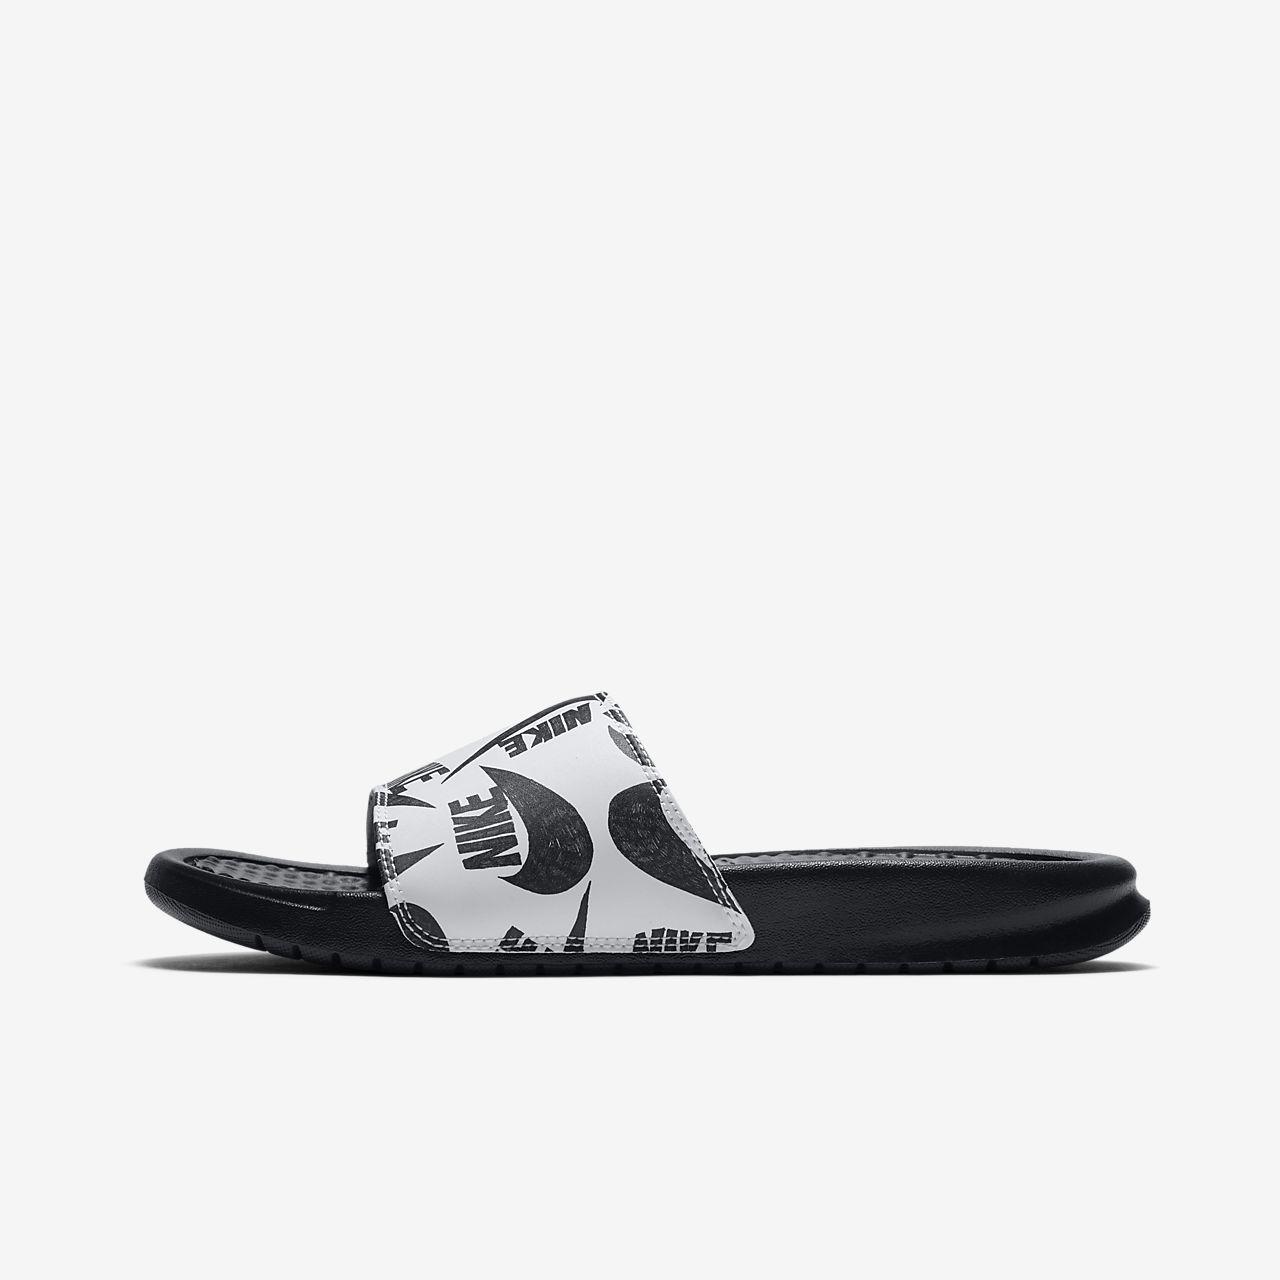 2017 Nike Air Jordan 4 mirror whole black men basketball shoes